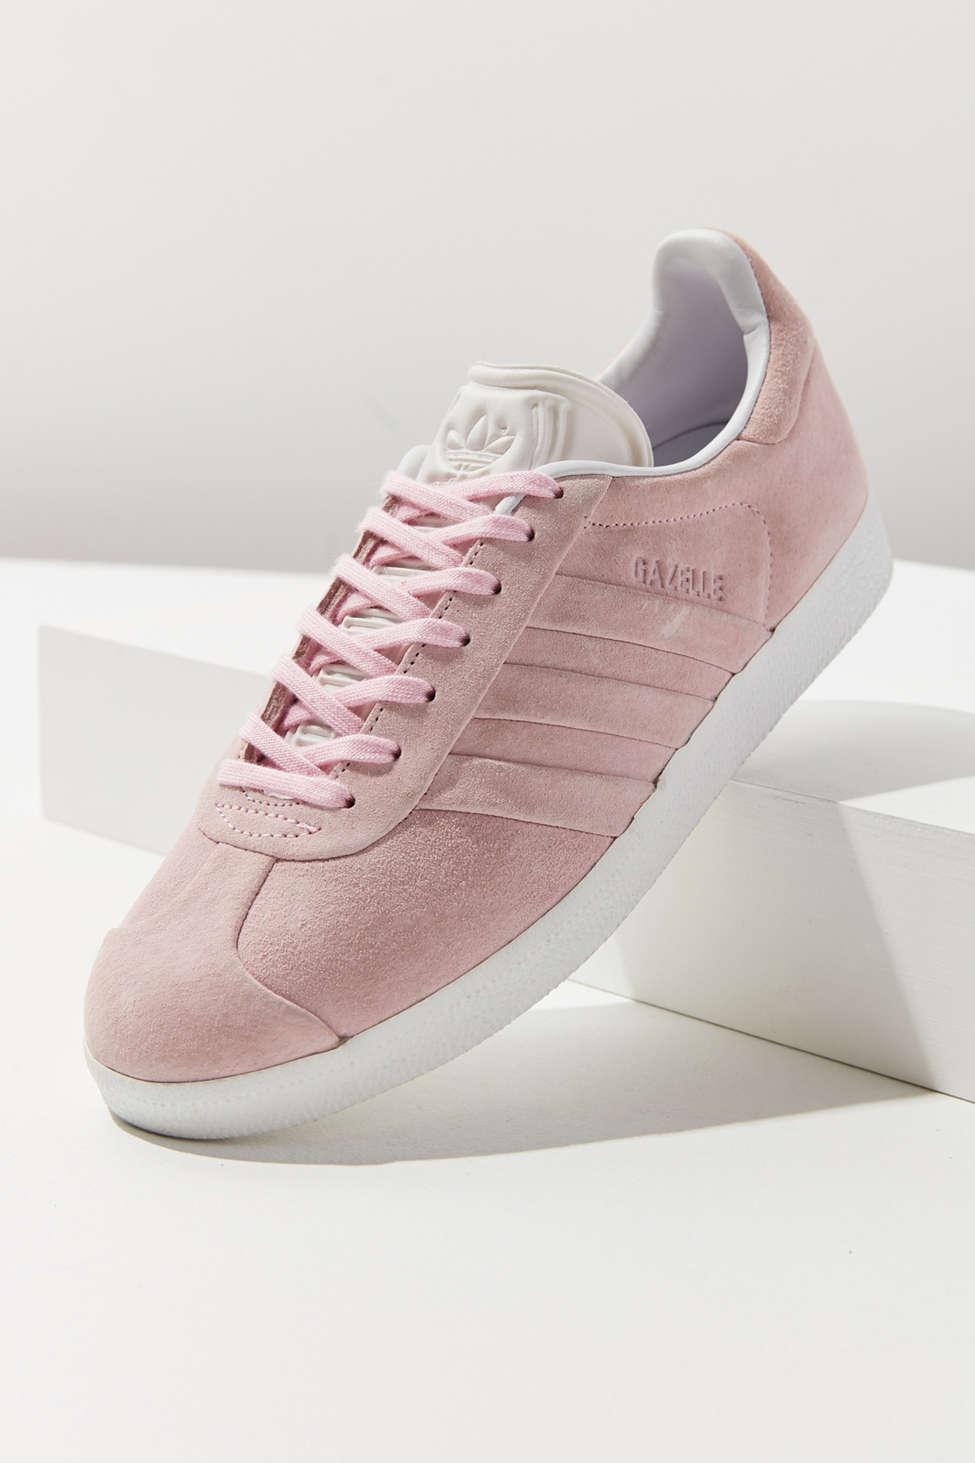 Adidas Originals Gazelle Stitch And Turn W Pink Sneakers